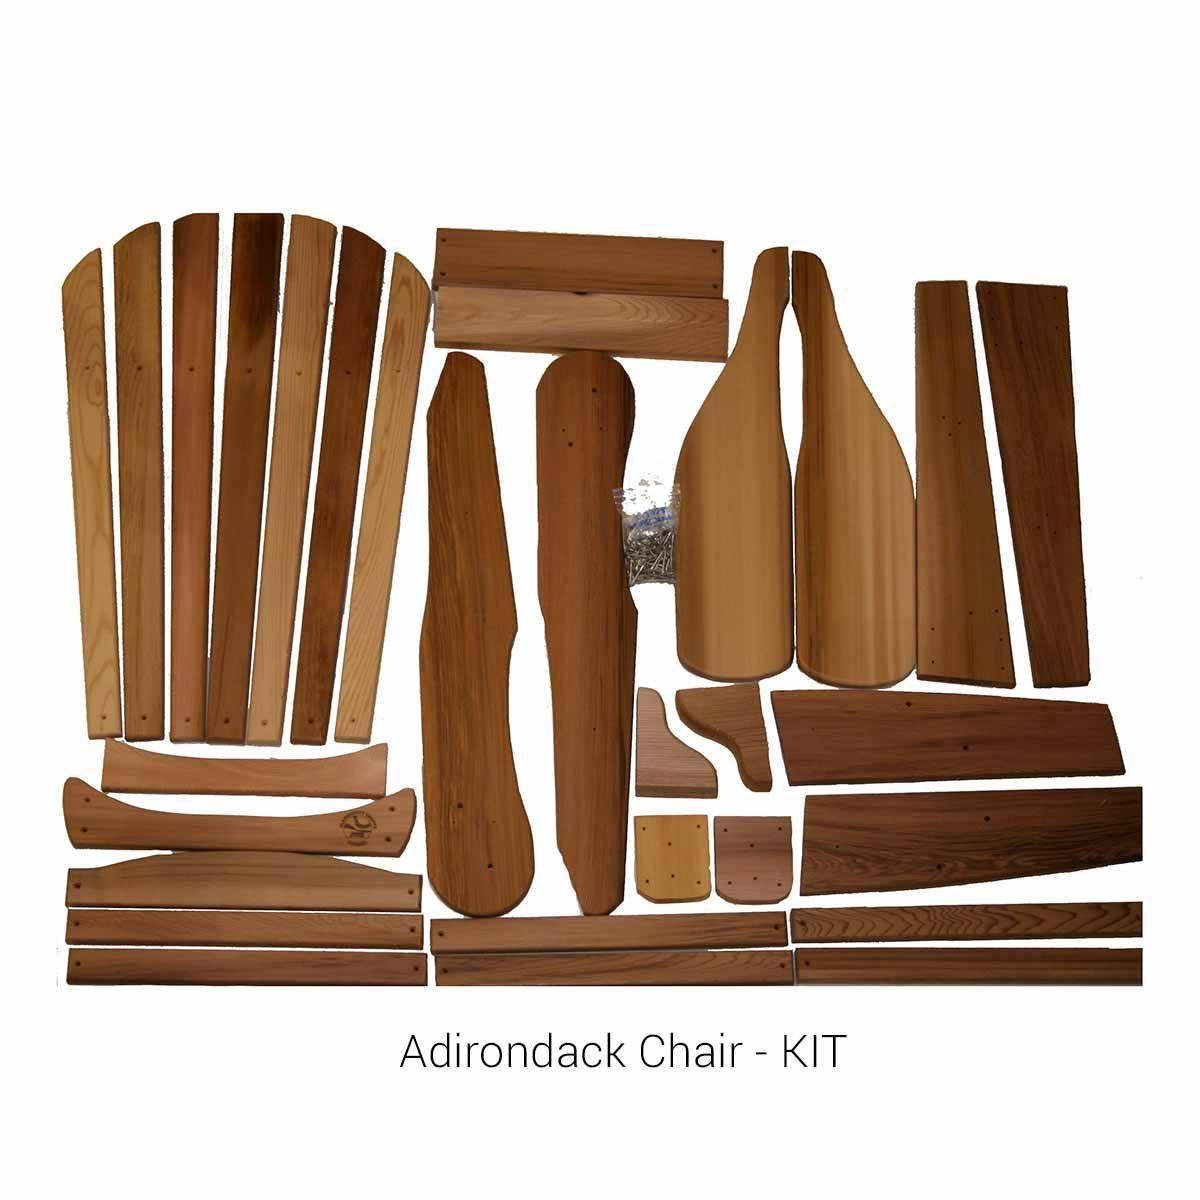 Adirondack Chair Kit Versus Knock Down Sillas Adirondack